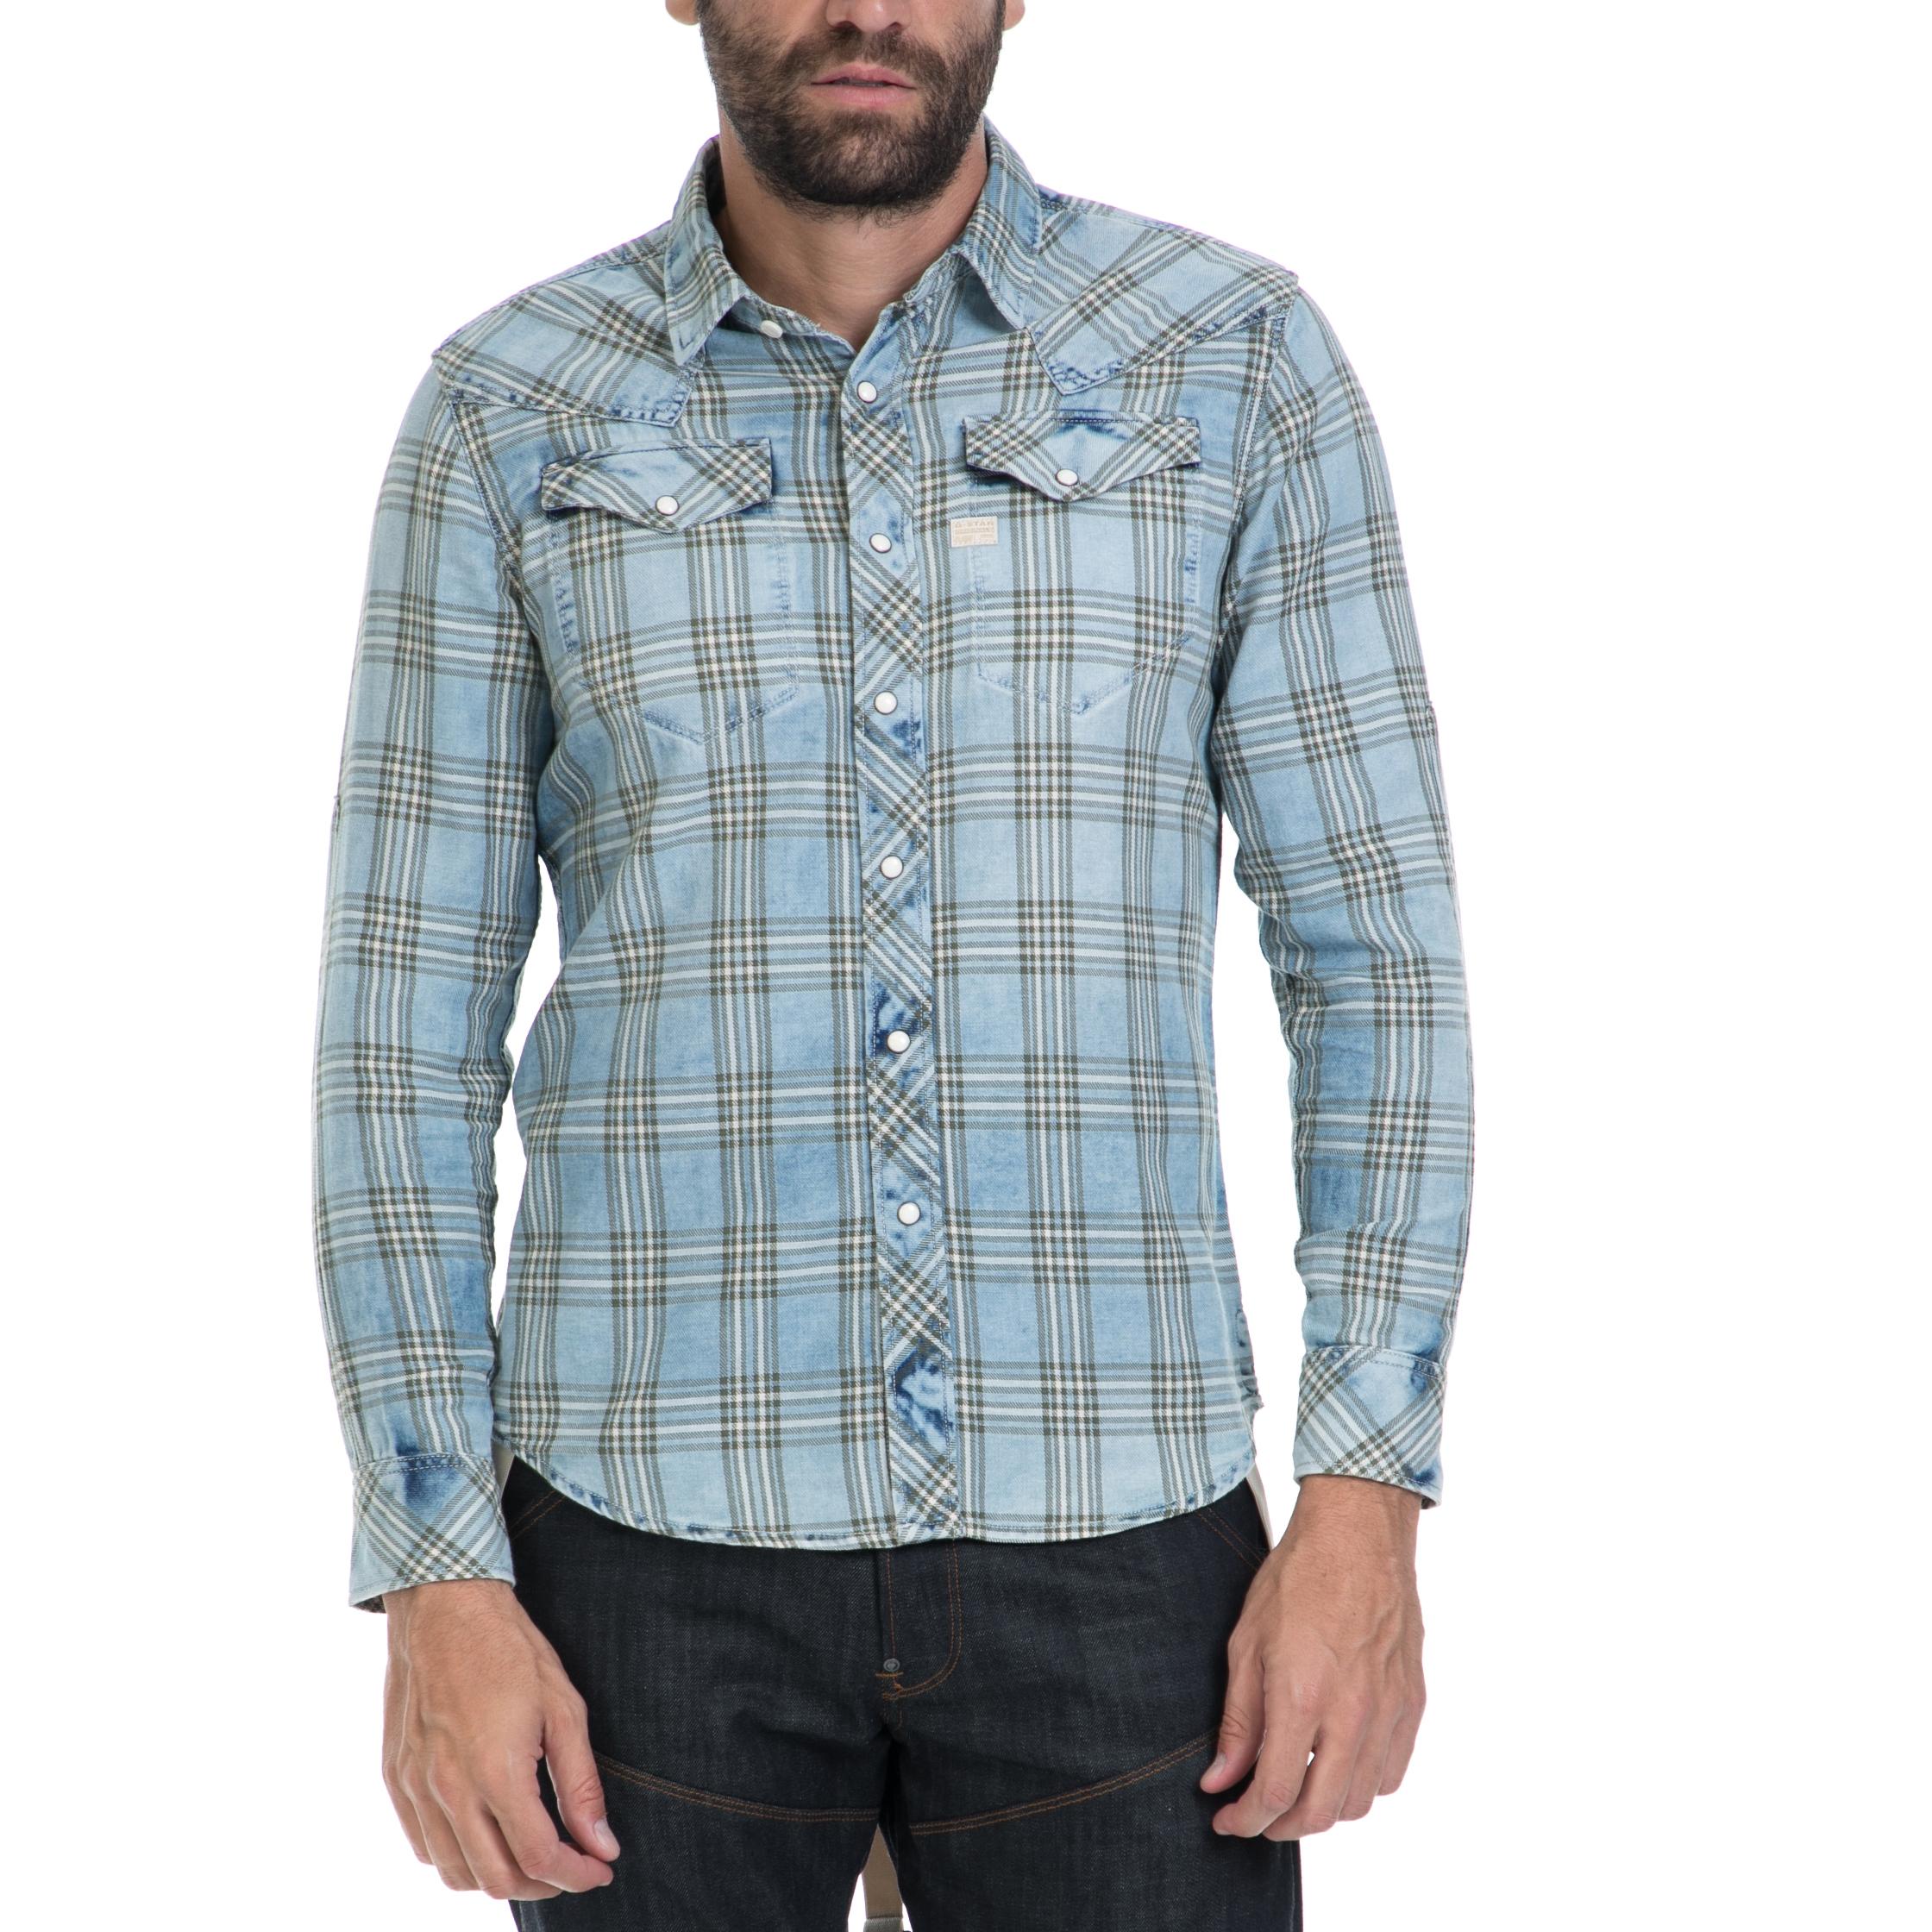 G-STAR RAW – Αντρικό πουκάμισο G-STAR RAW μπλε